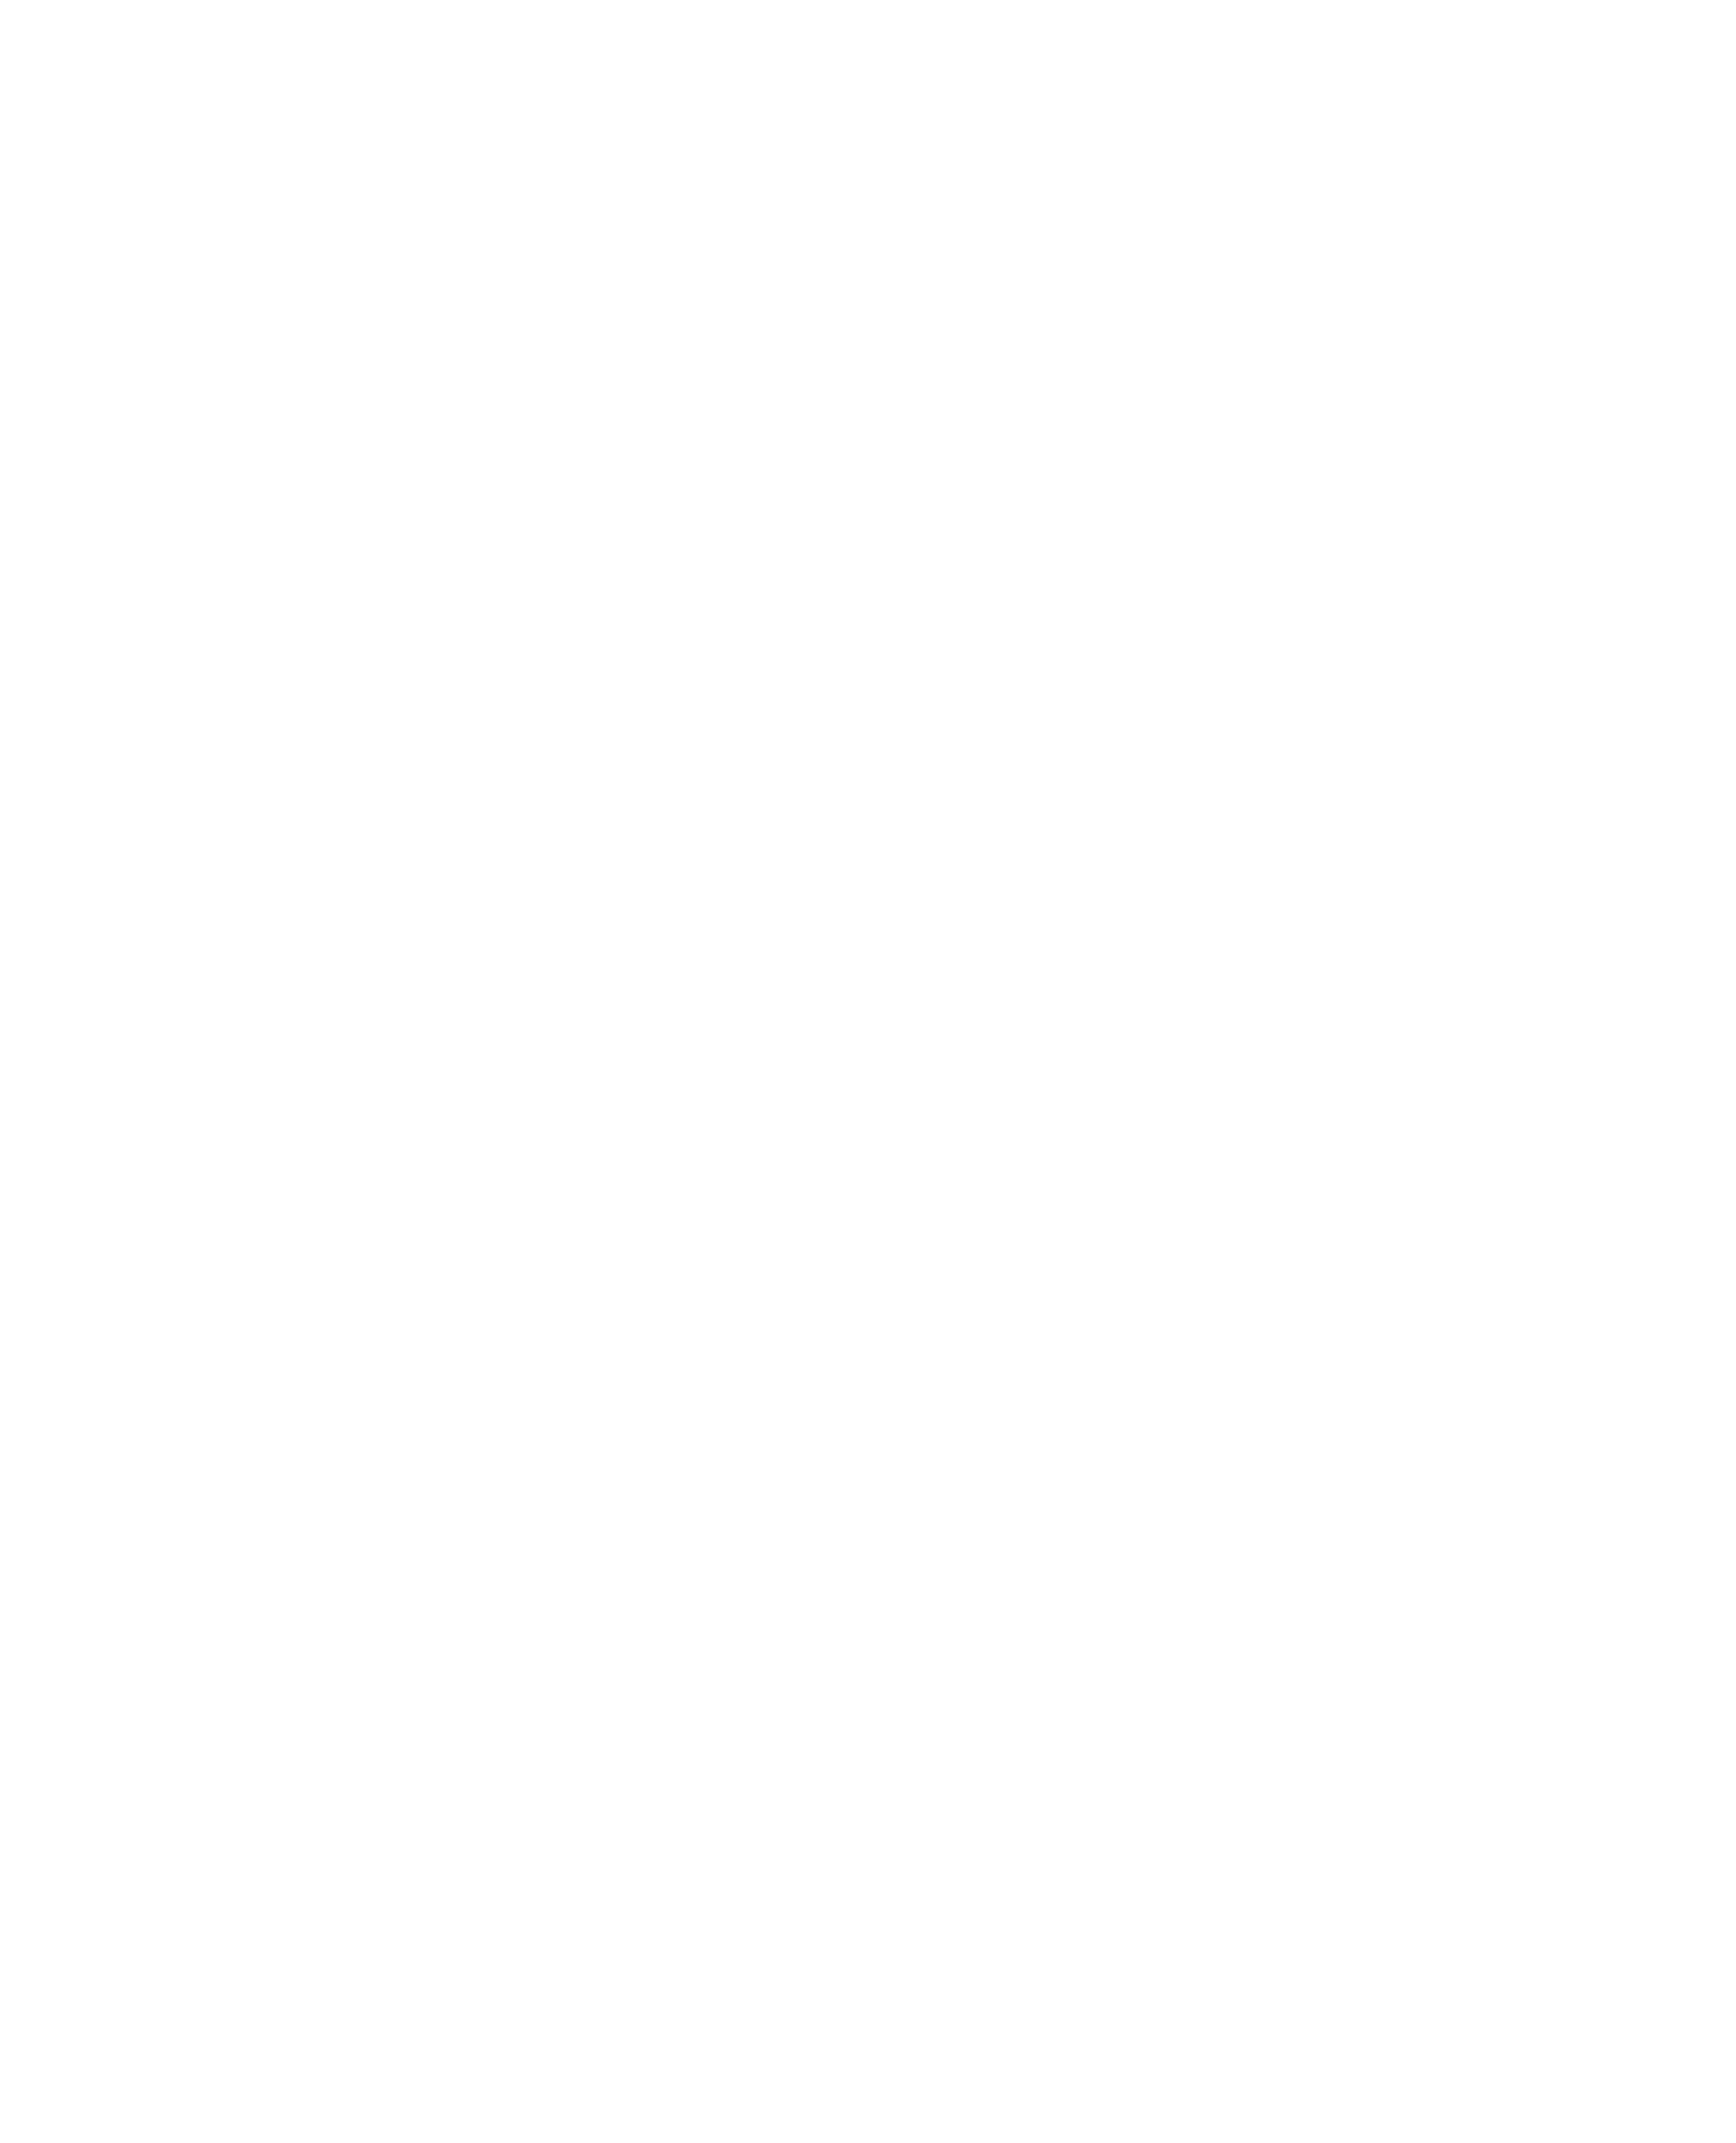 indian lady illustration 02